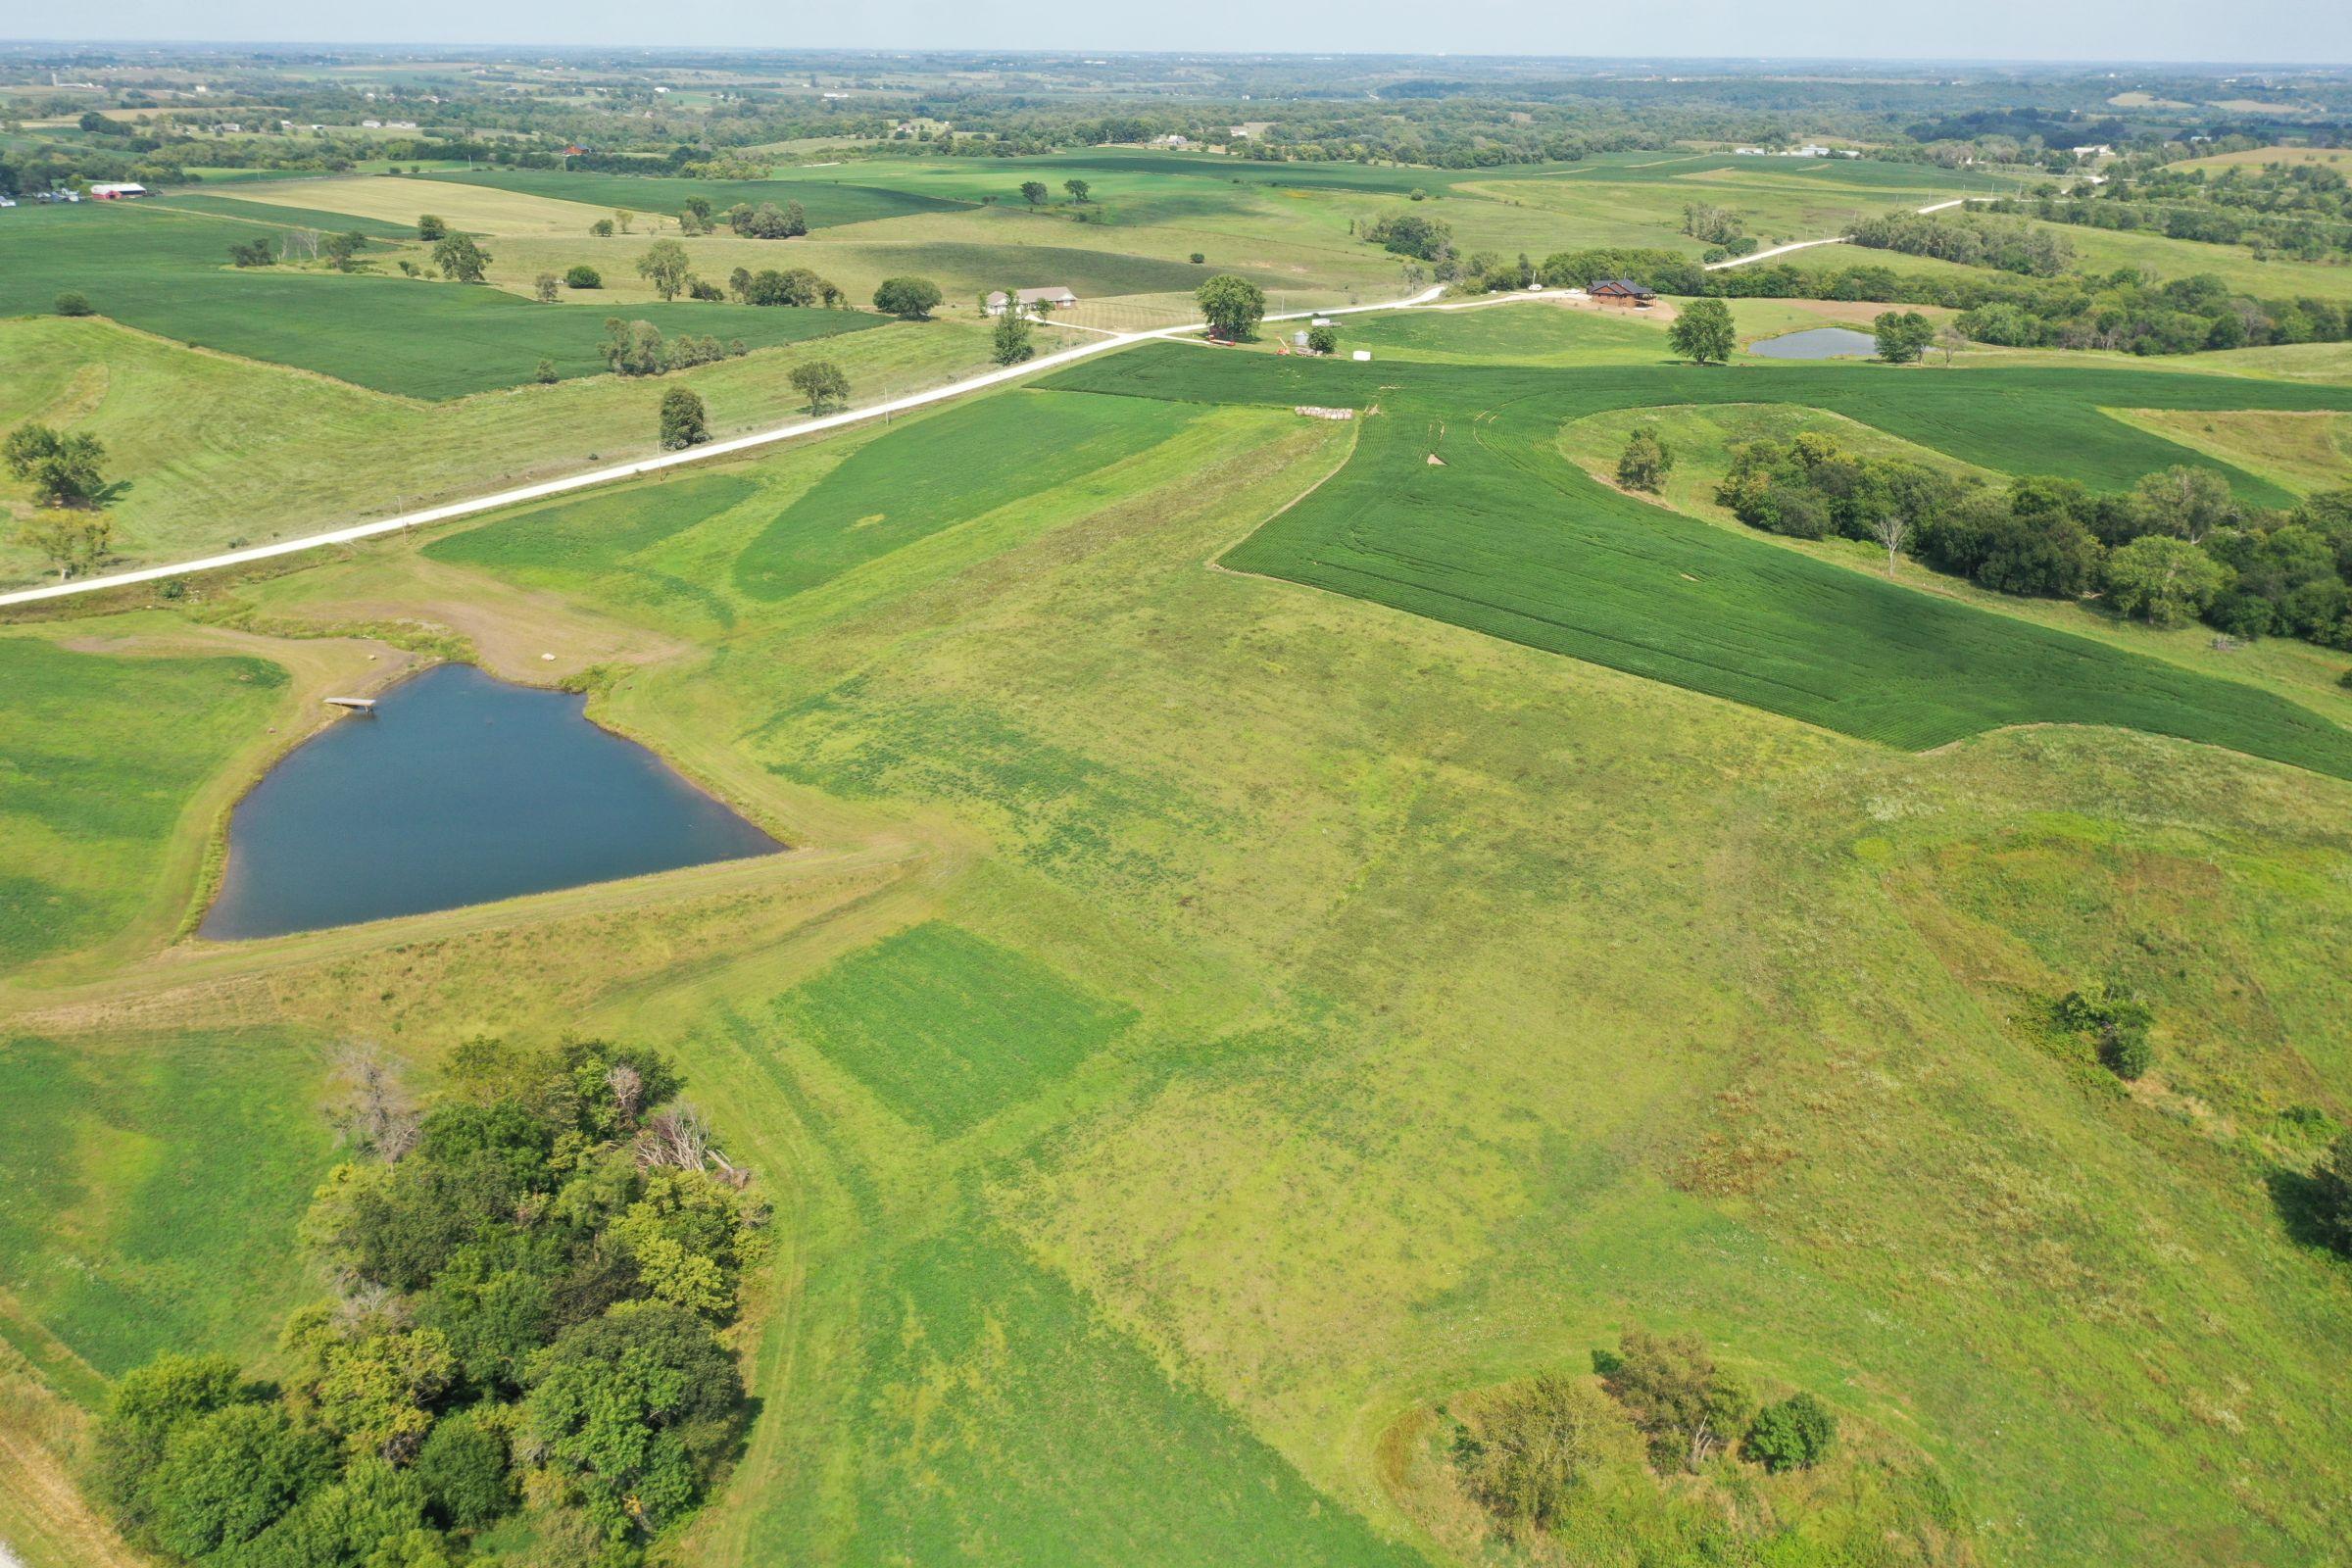 land-warren-county-iowa-8-acres-listing-number-15696-4-2021-08-24-222437.JPG